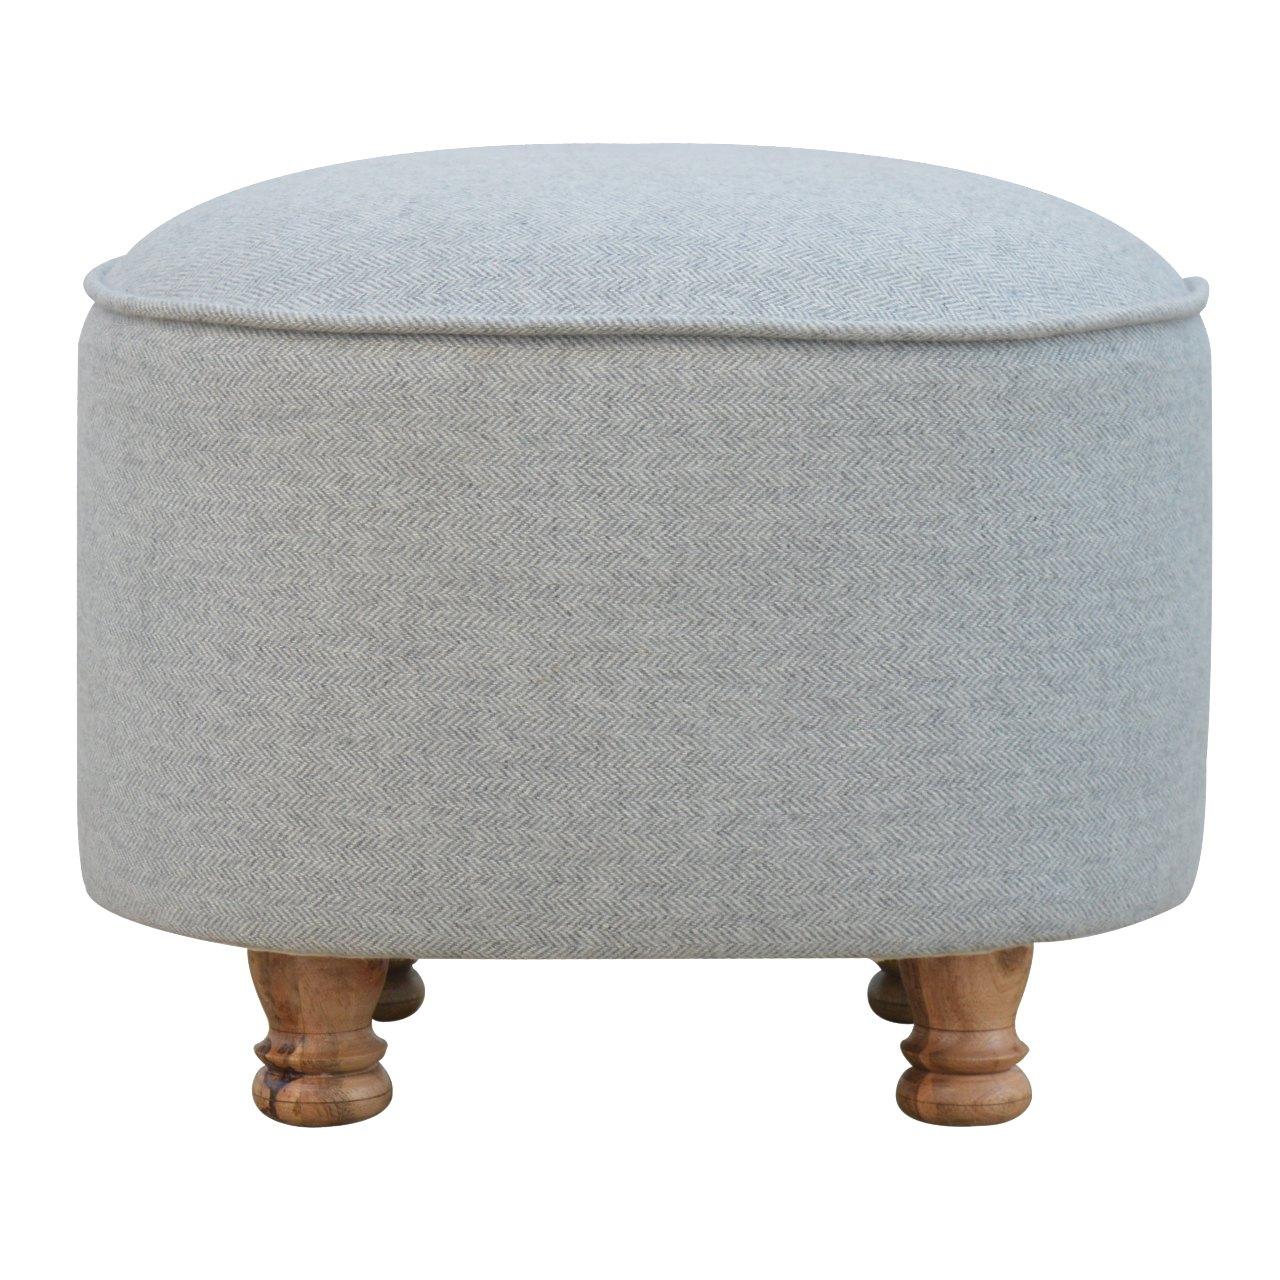 Handmade Solid Wood Light Grey Tweed Upholstered Oval Footstool Oak-Ish Bun Feet